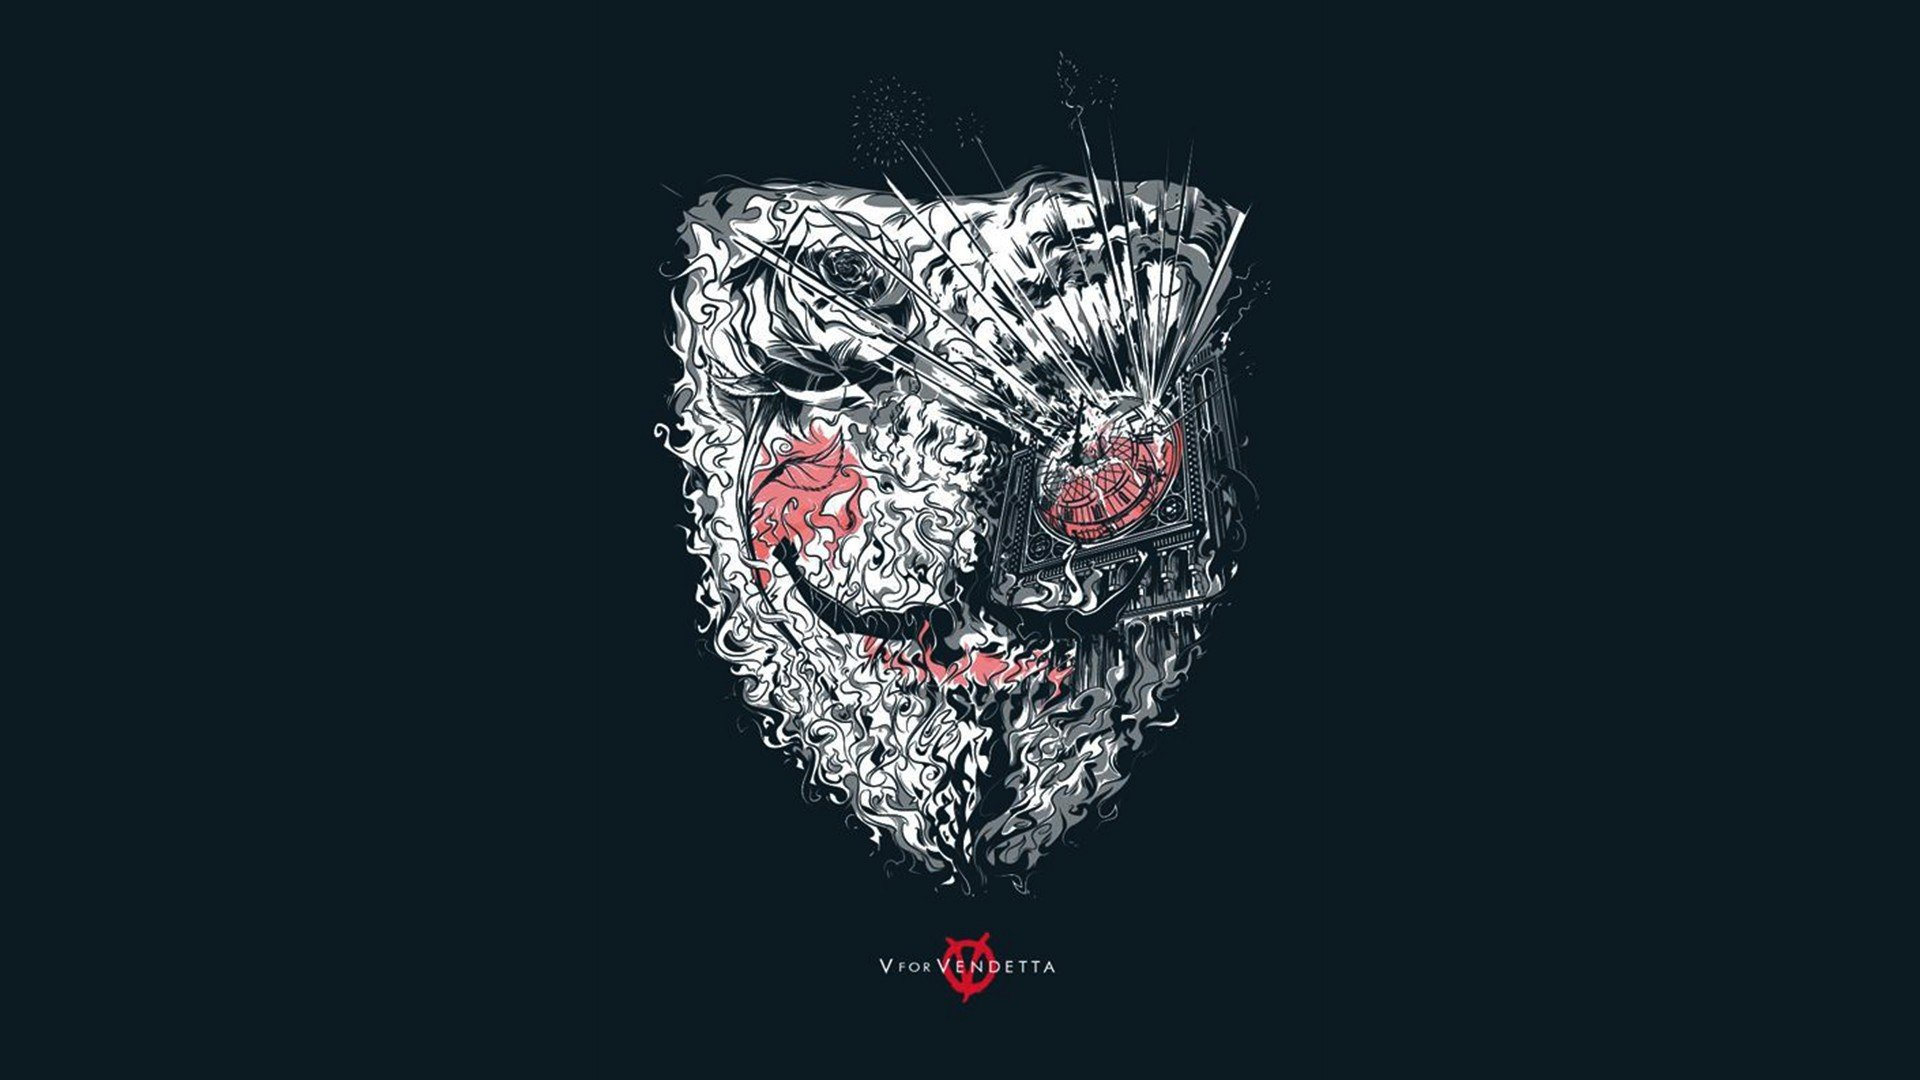 smiling, V for Vendetta, Simple background Wallpaper